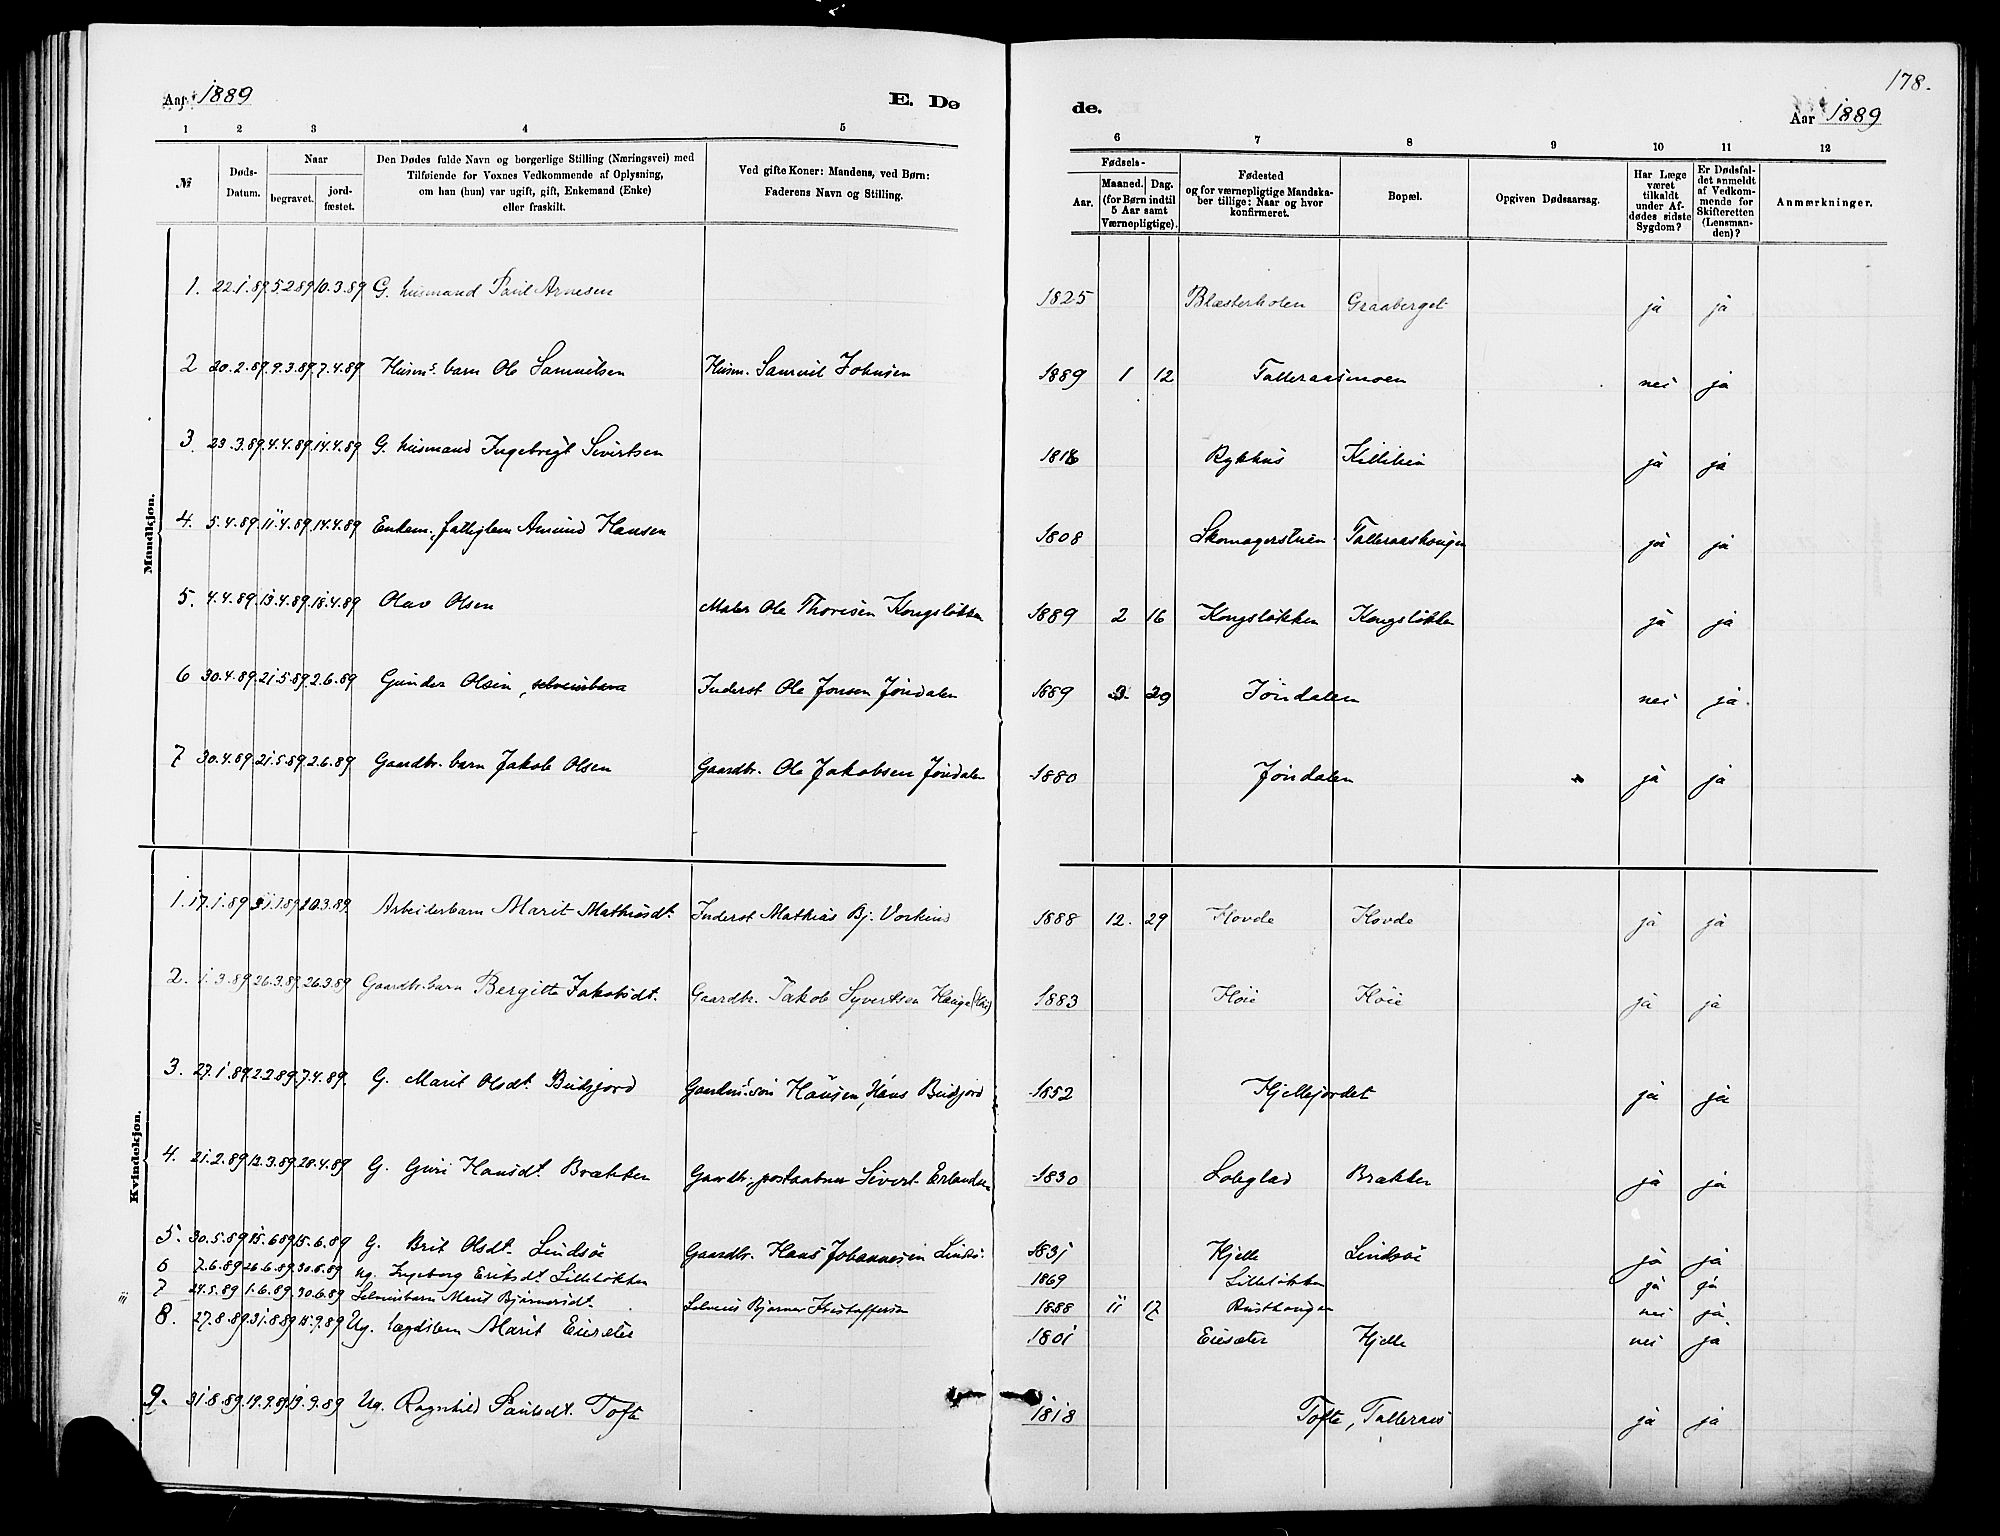 SAH, Dovre prestekontor, Ministerialbok nr. 2, 1879-1890, s. 178